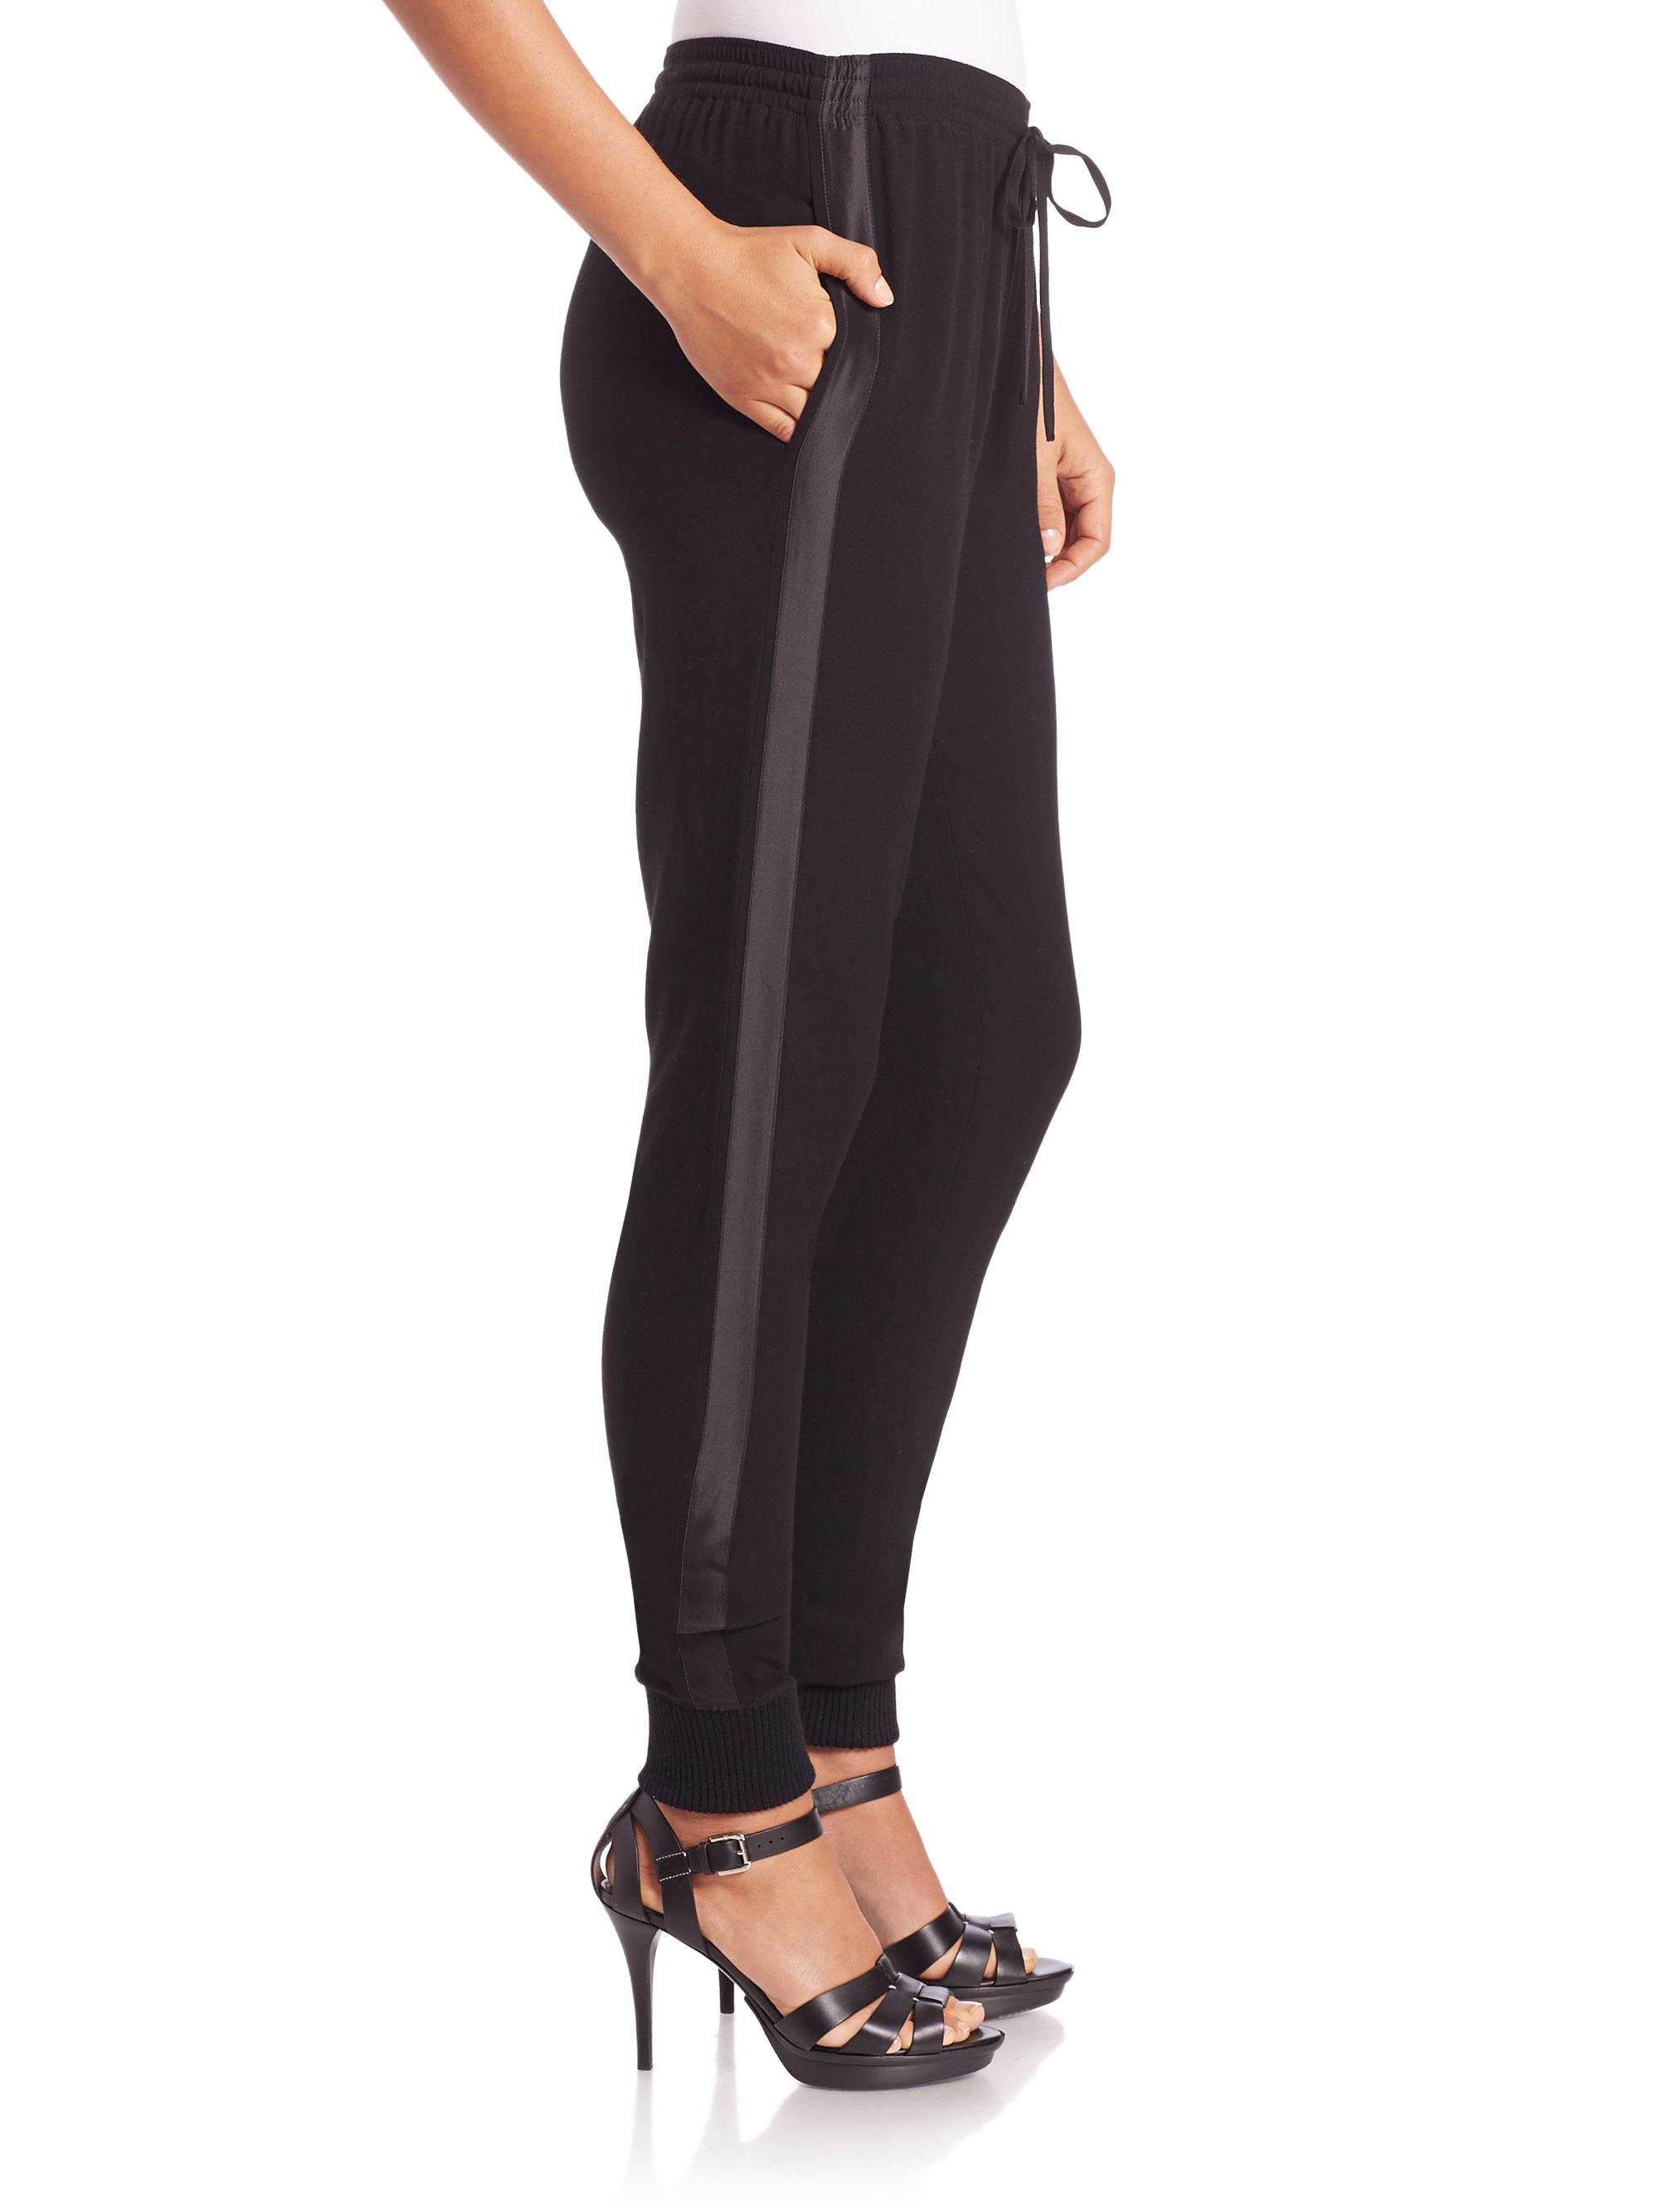 89b059039ad Lyst - Polo Ralph Lauren Satin Tuxedo Jogger Pants in Black